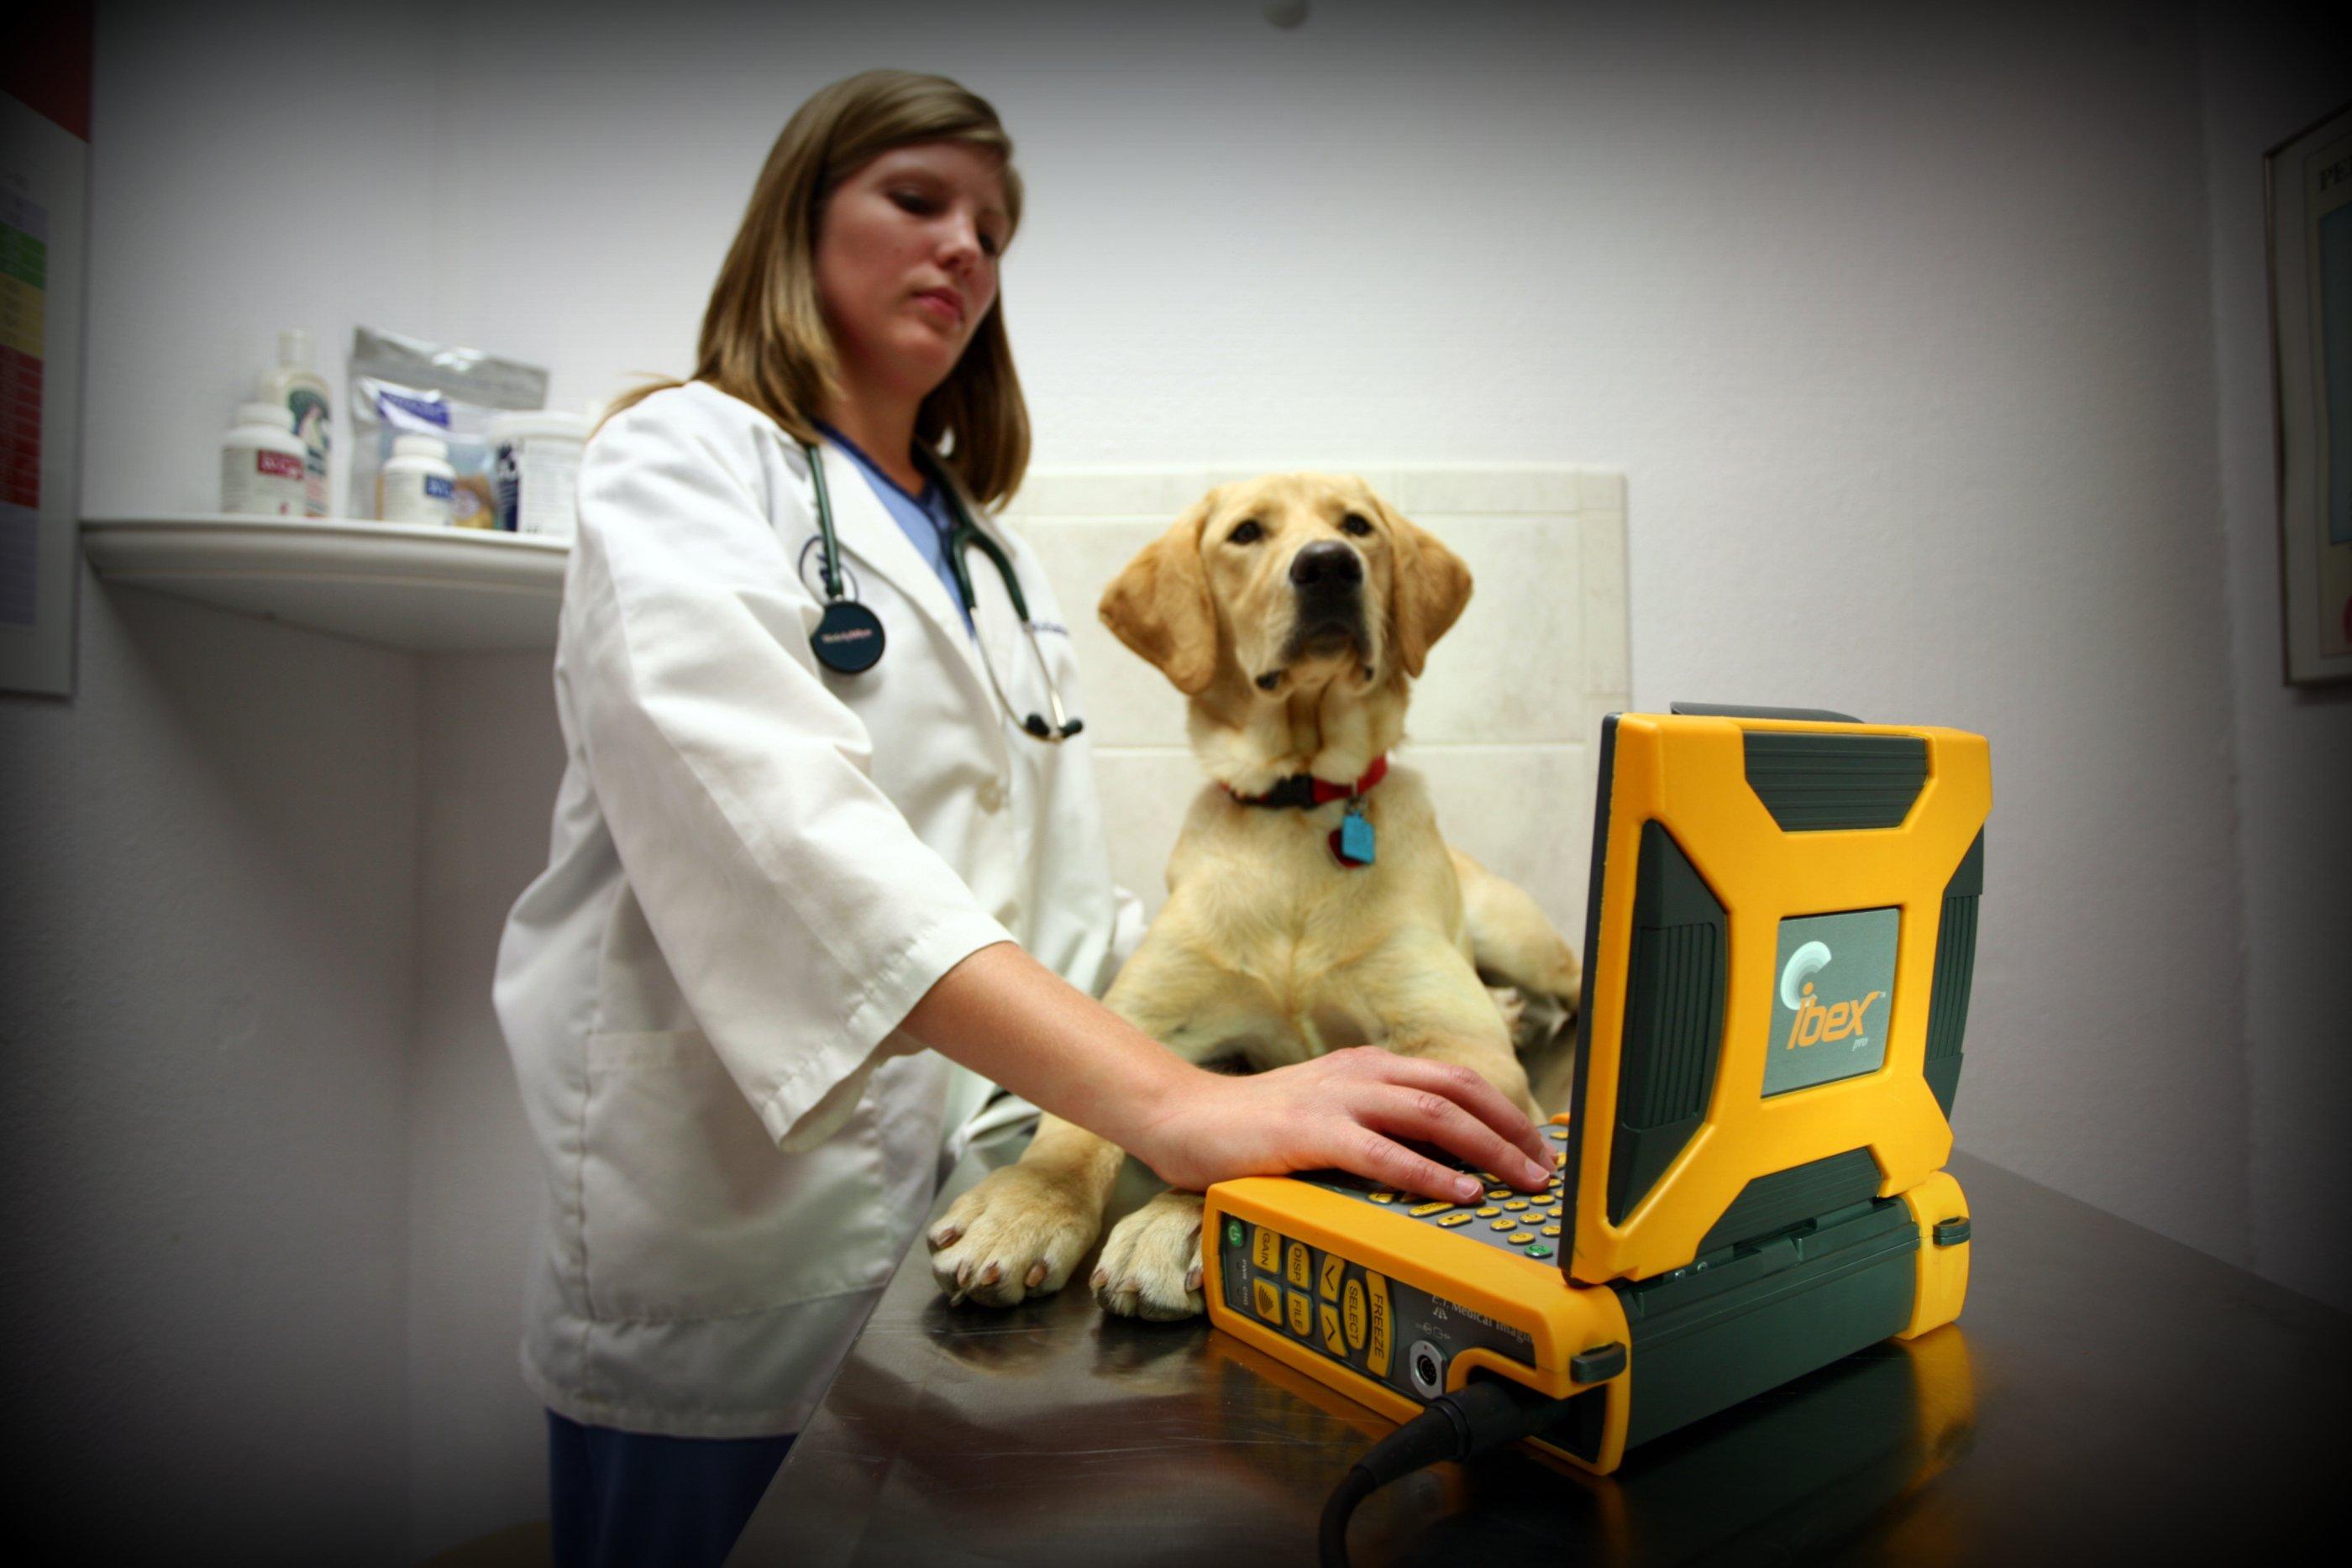 veterinarian communication, veterinary ultrasound, cow ultrasound, waterproof ultrasound